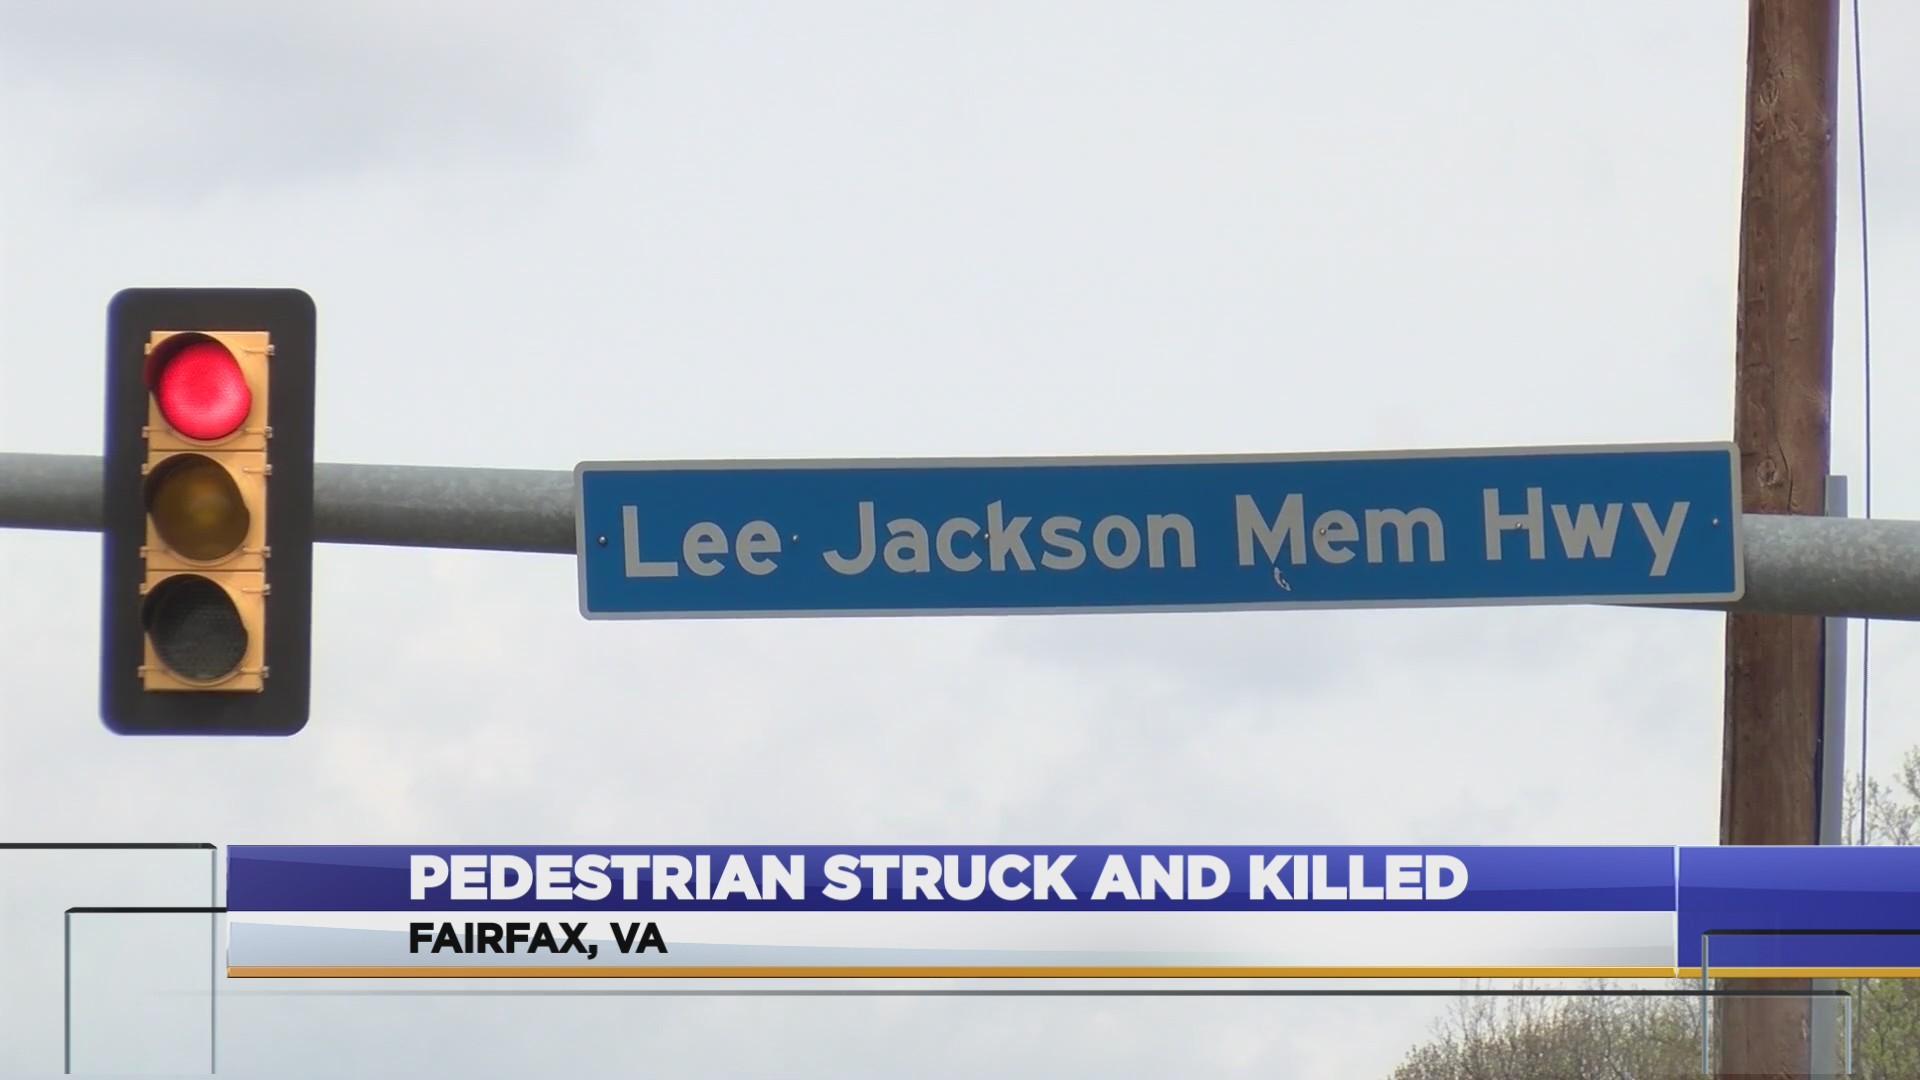 Fatal_pedestrian_accident_Lee_Jackson_Me_0_20190409221717